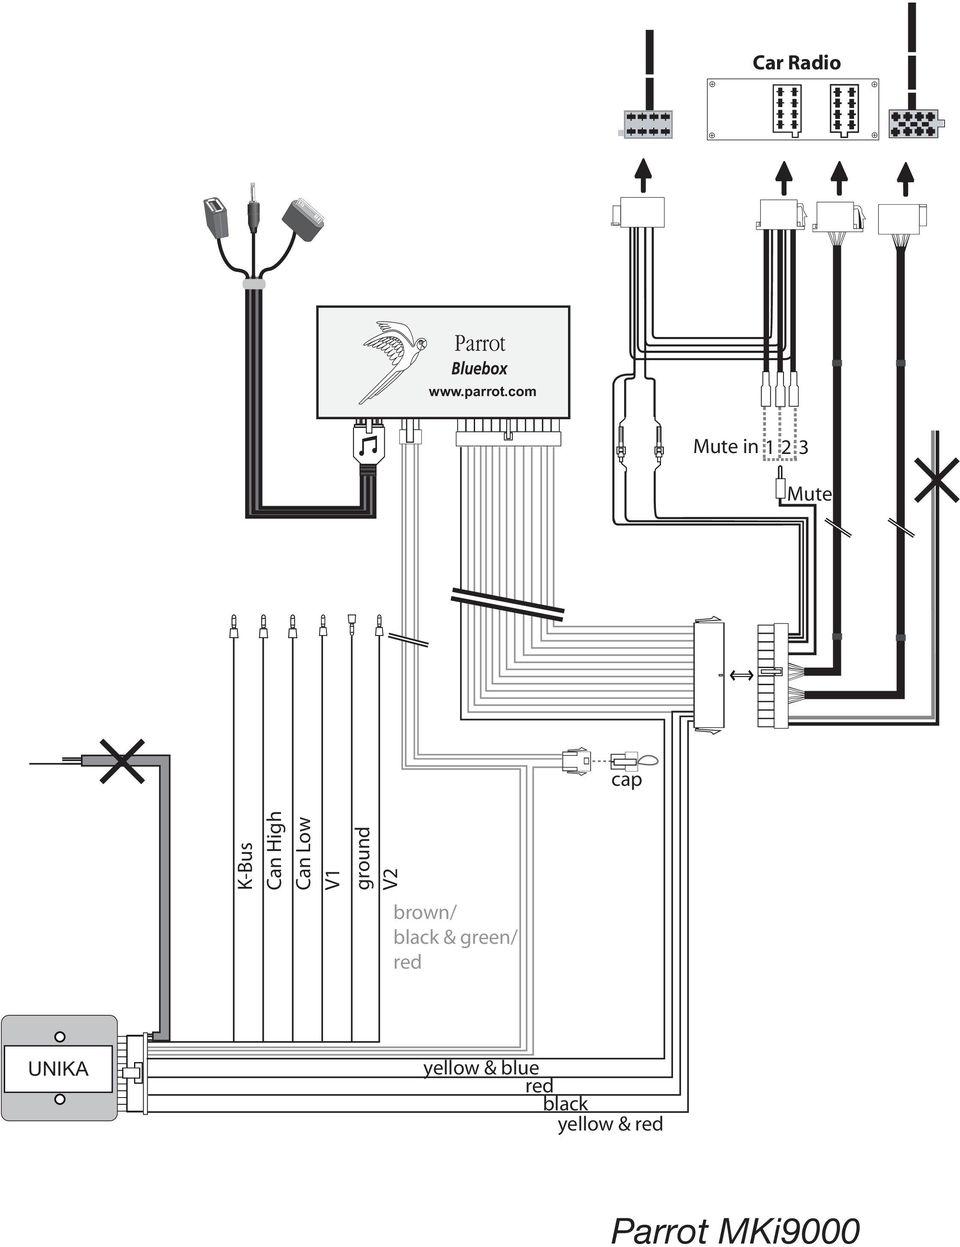 Parrot Mki9200 Wiring Diagram : Parrot mki installation wiring diagram